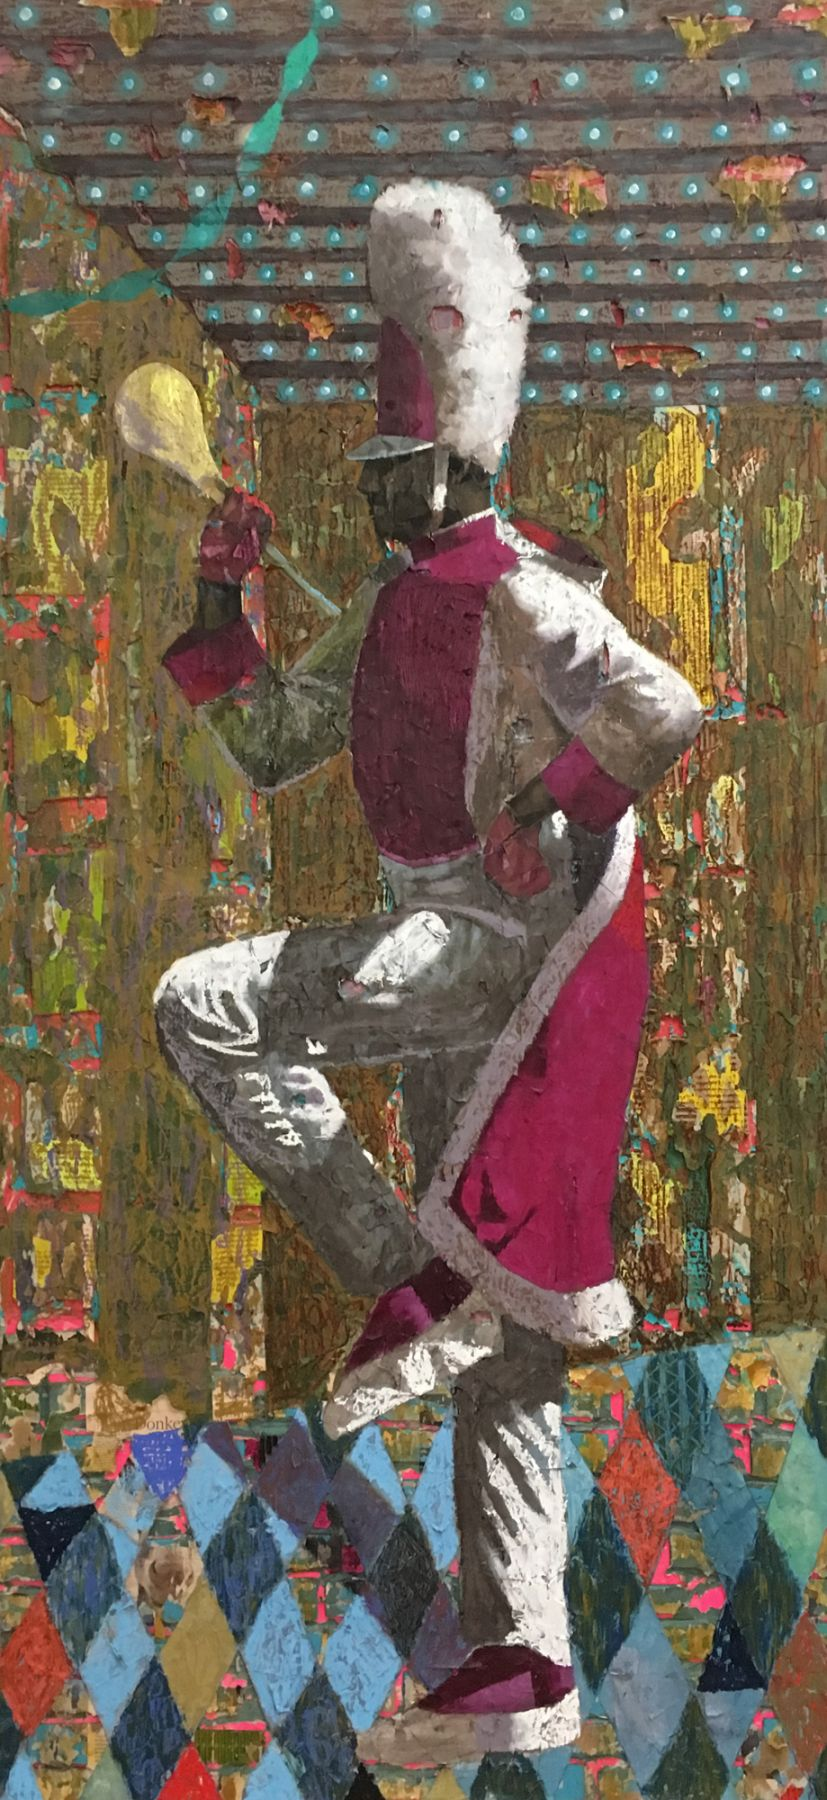 Derek Fordjour, Camelot